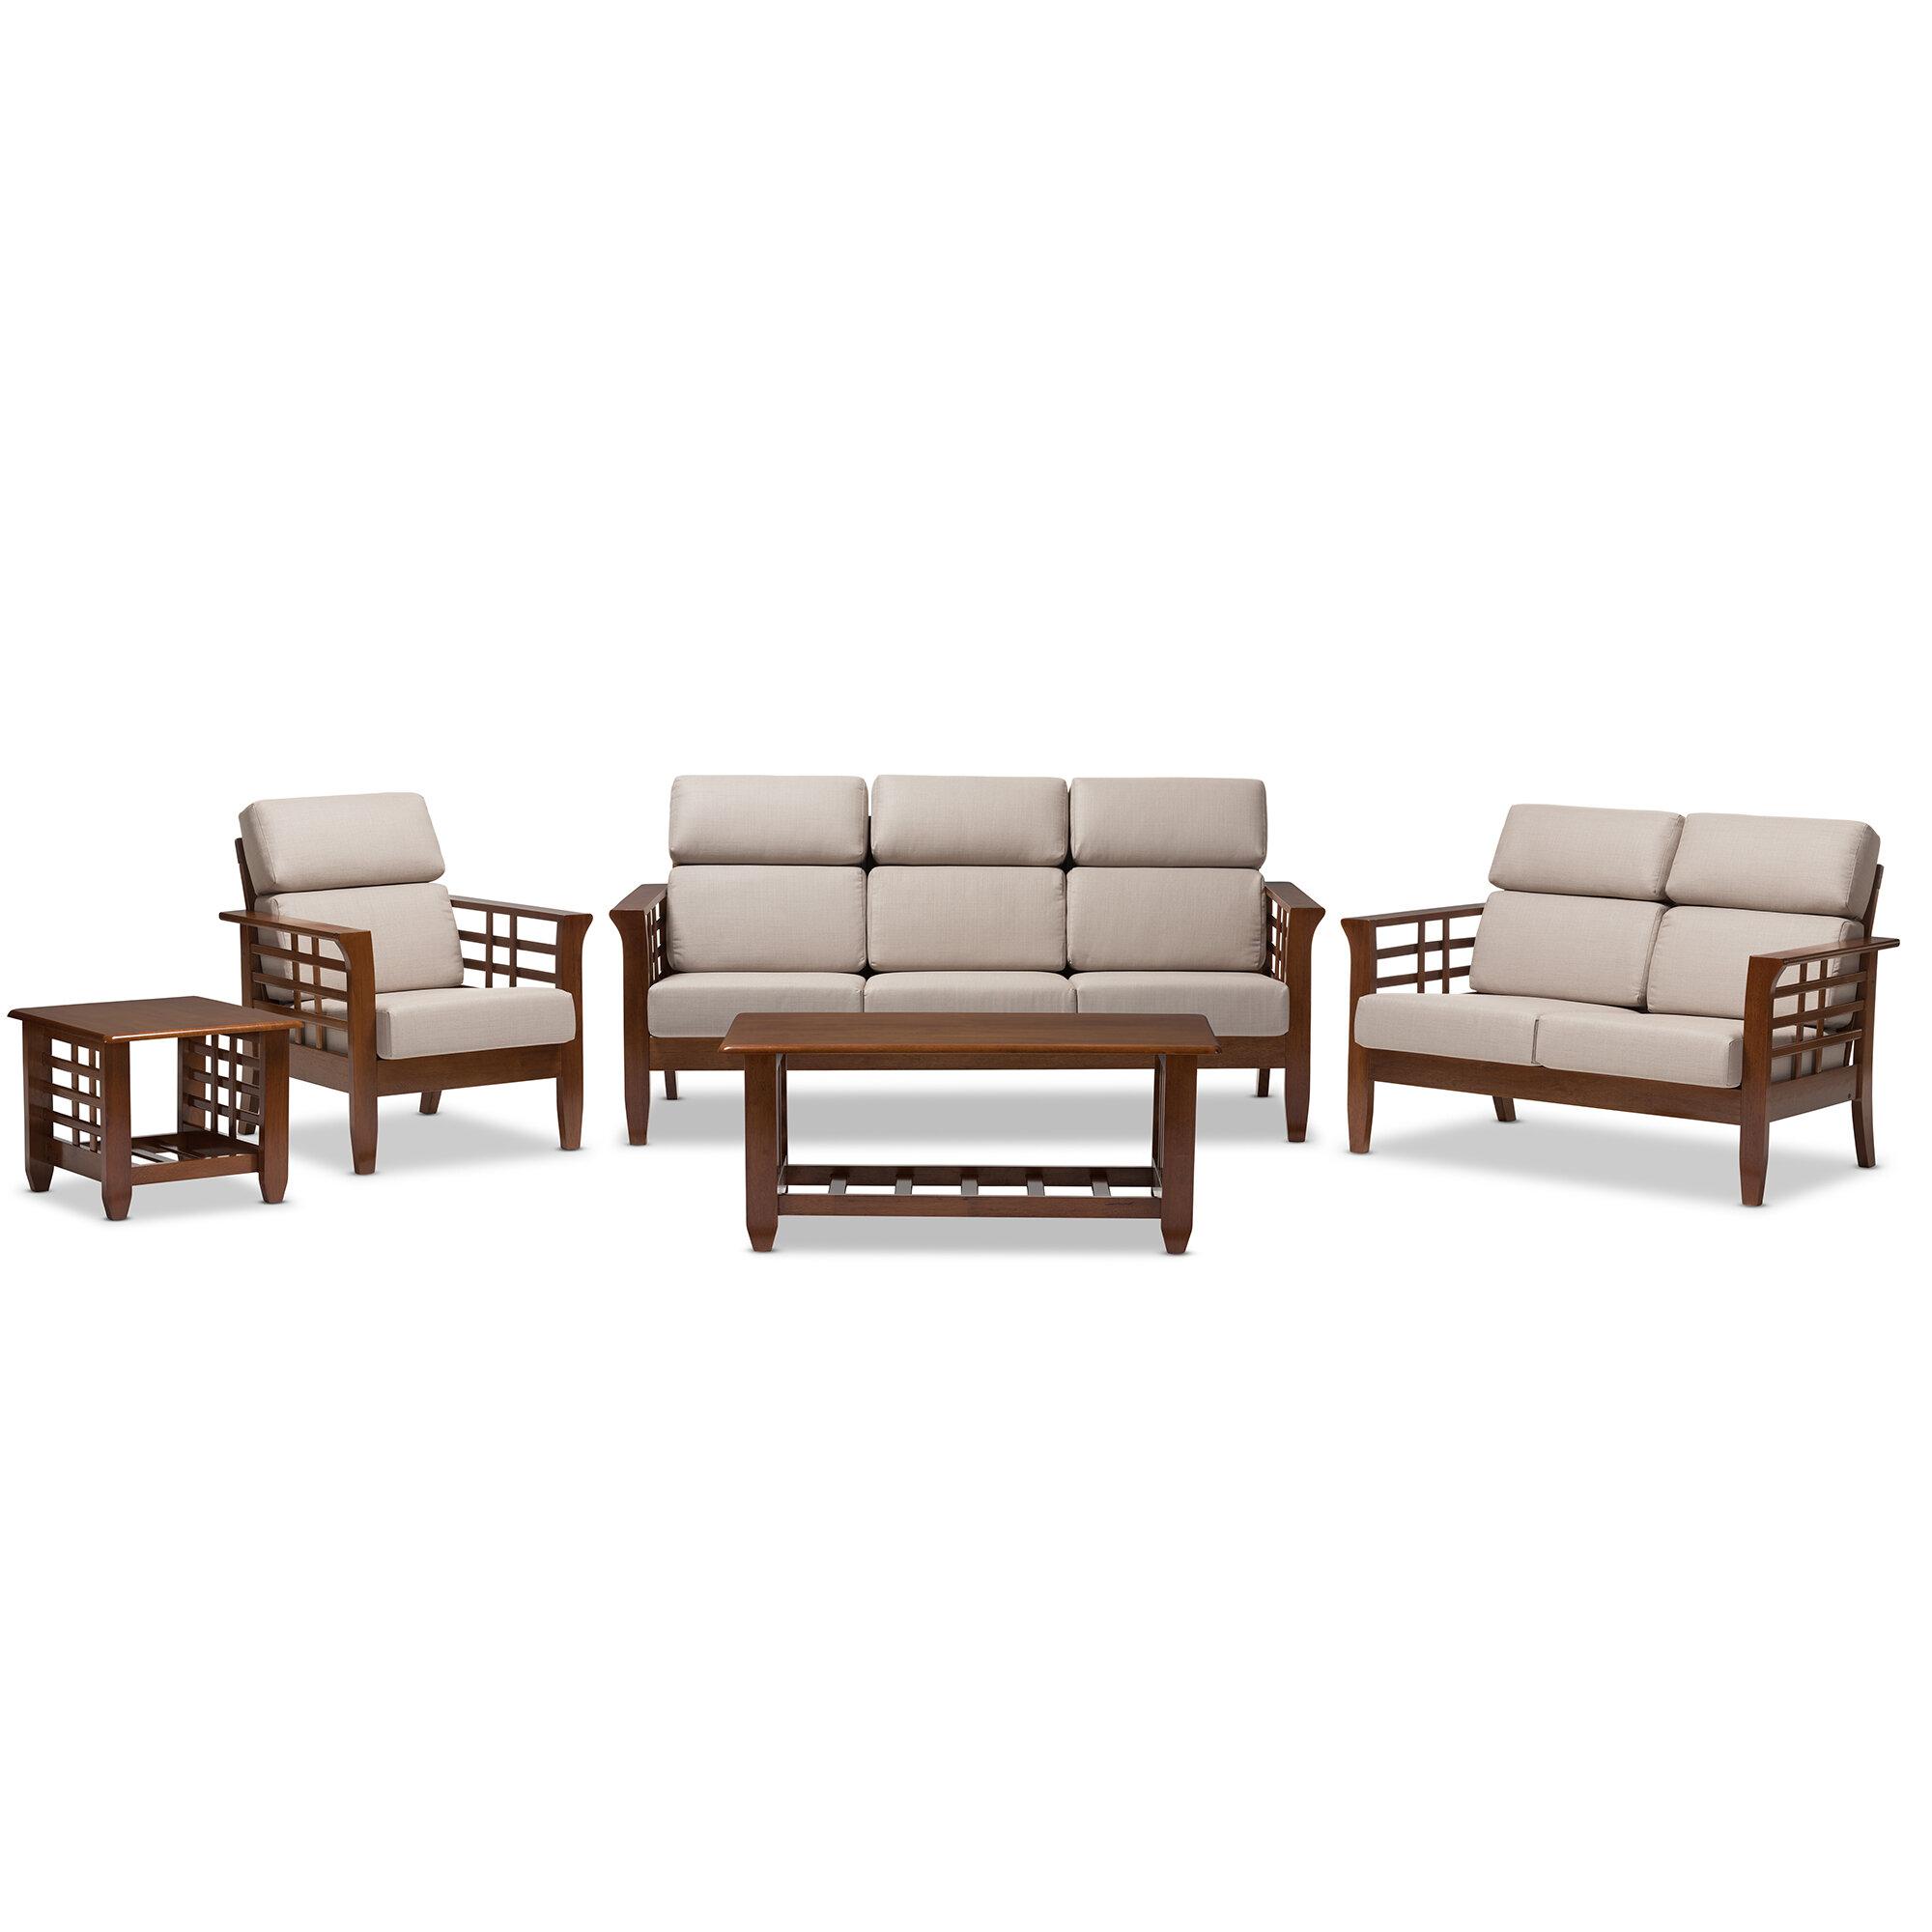 Latitude Run Mayon 5 Piece Living Room Set | Wayfair